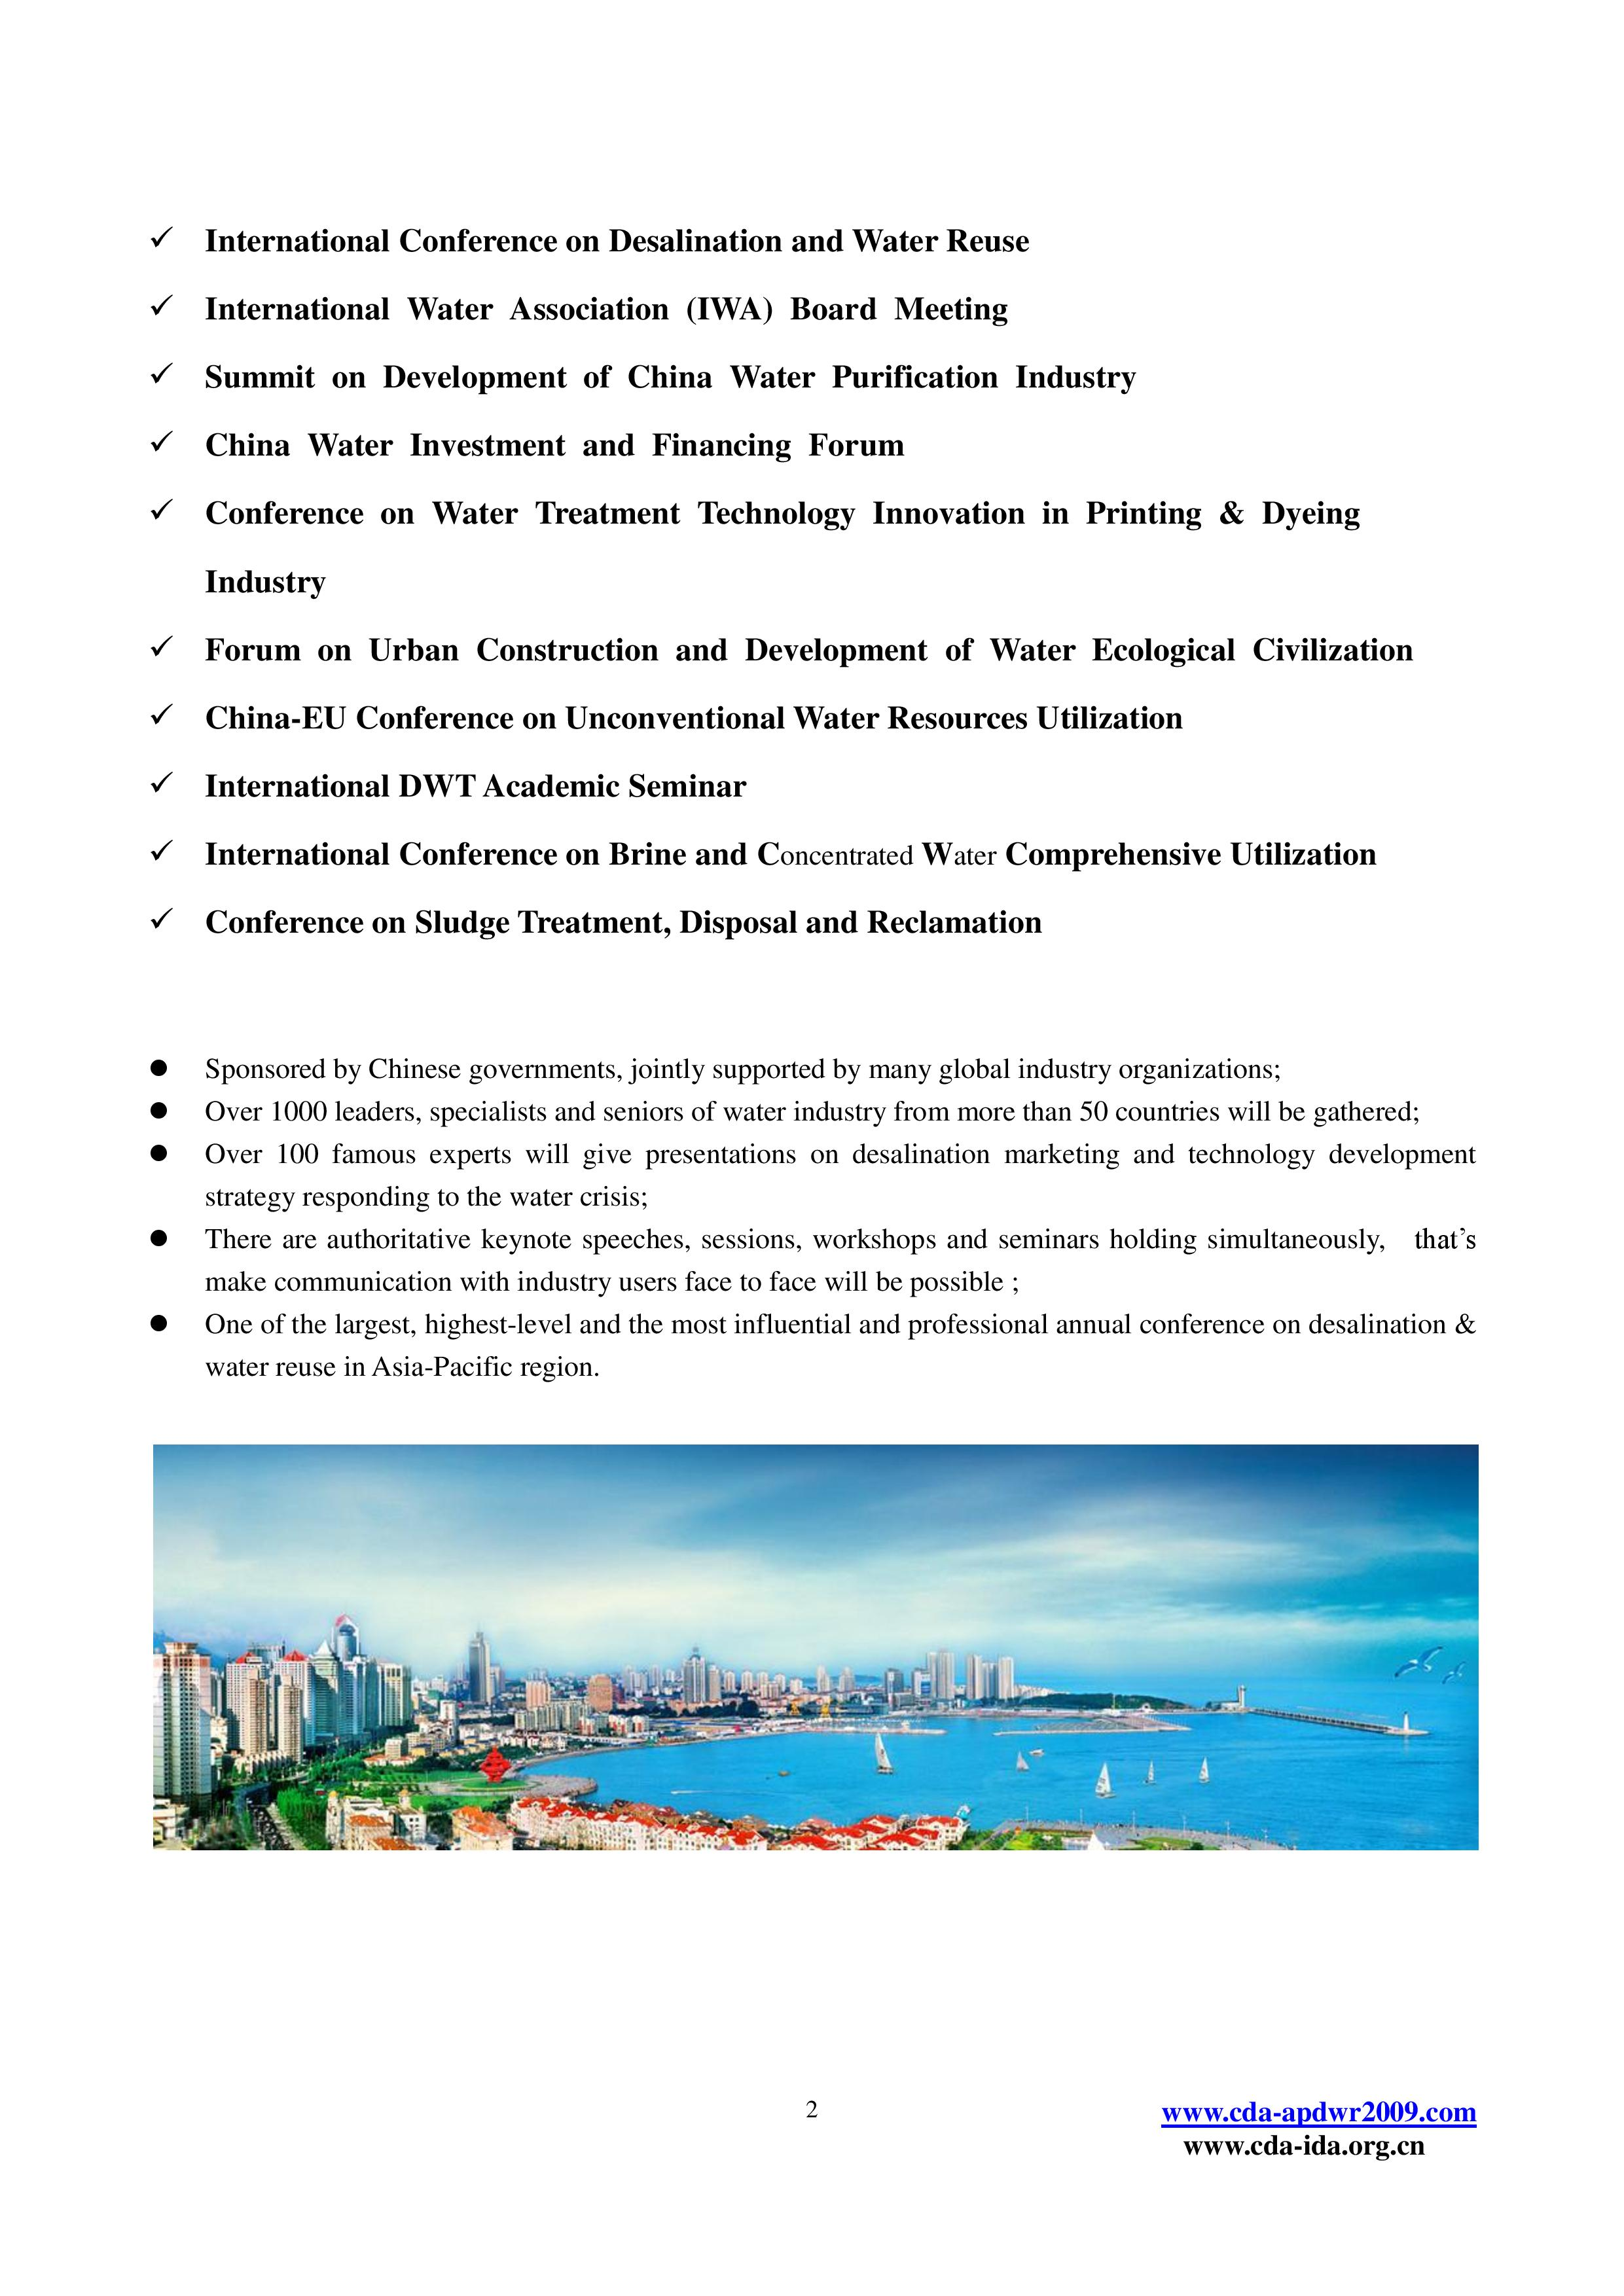 Presentation of NFS at Qingdao Int l Desalination & Water Reuse